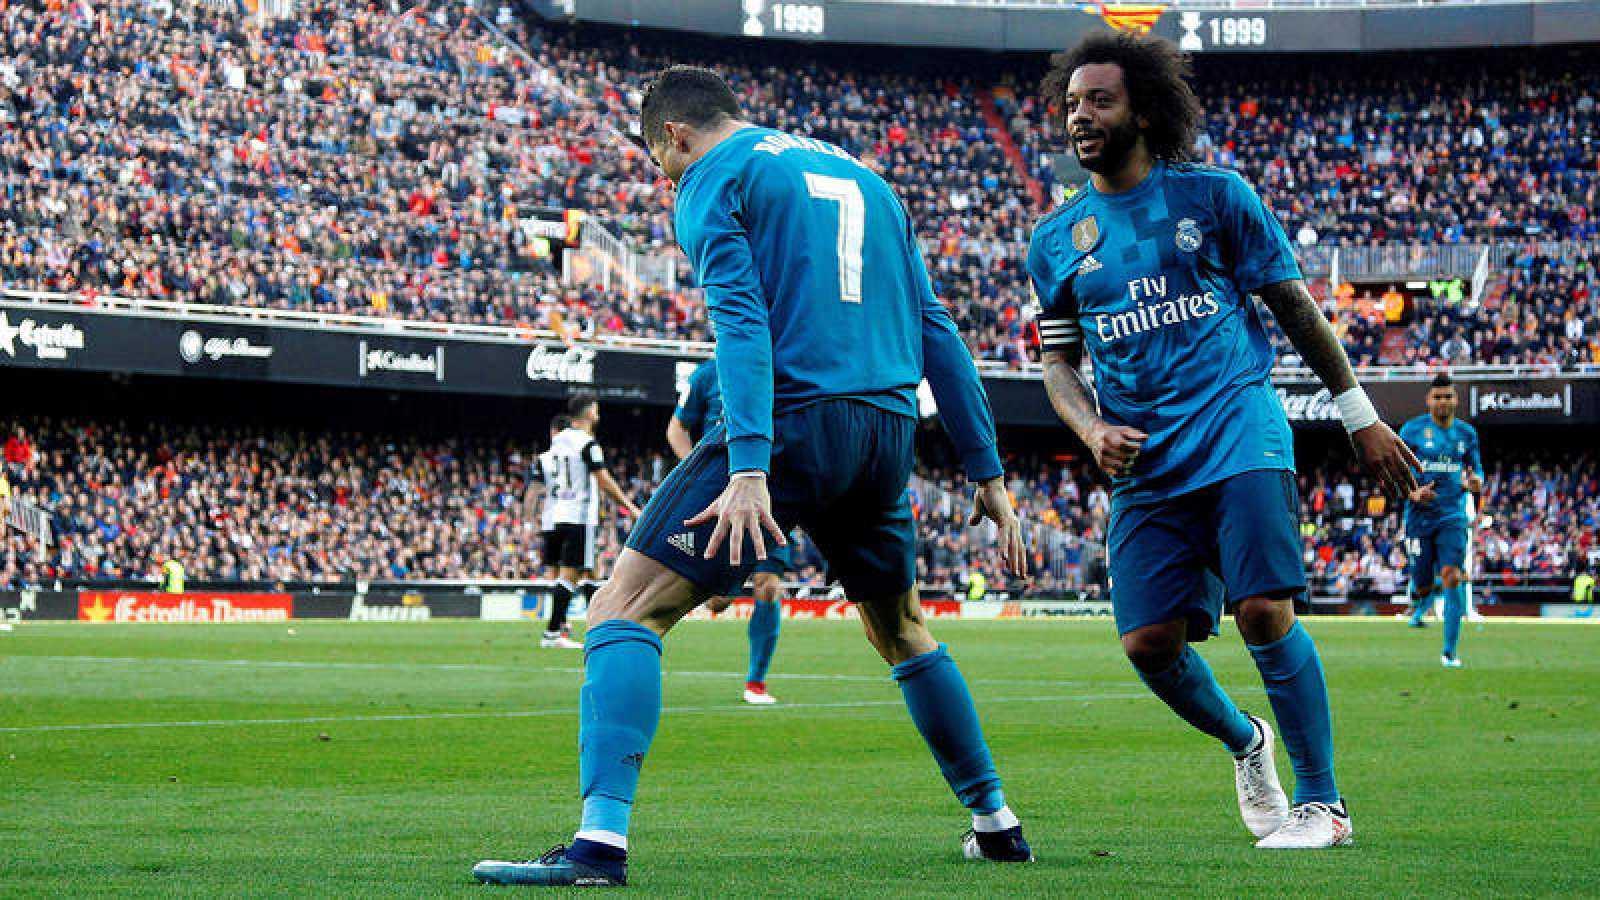 Cristiano Ronaldo celebra uno de sus dos penaltis en Mestalla.